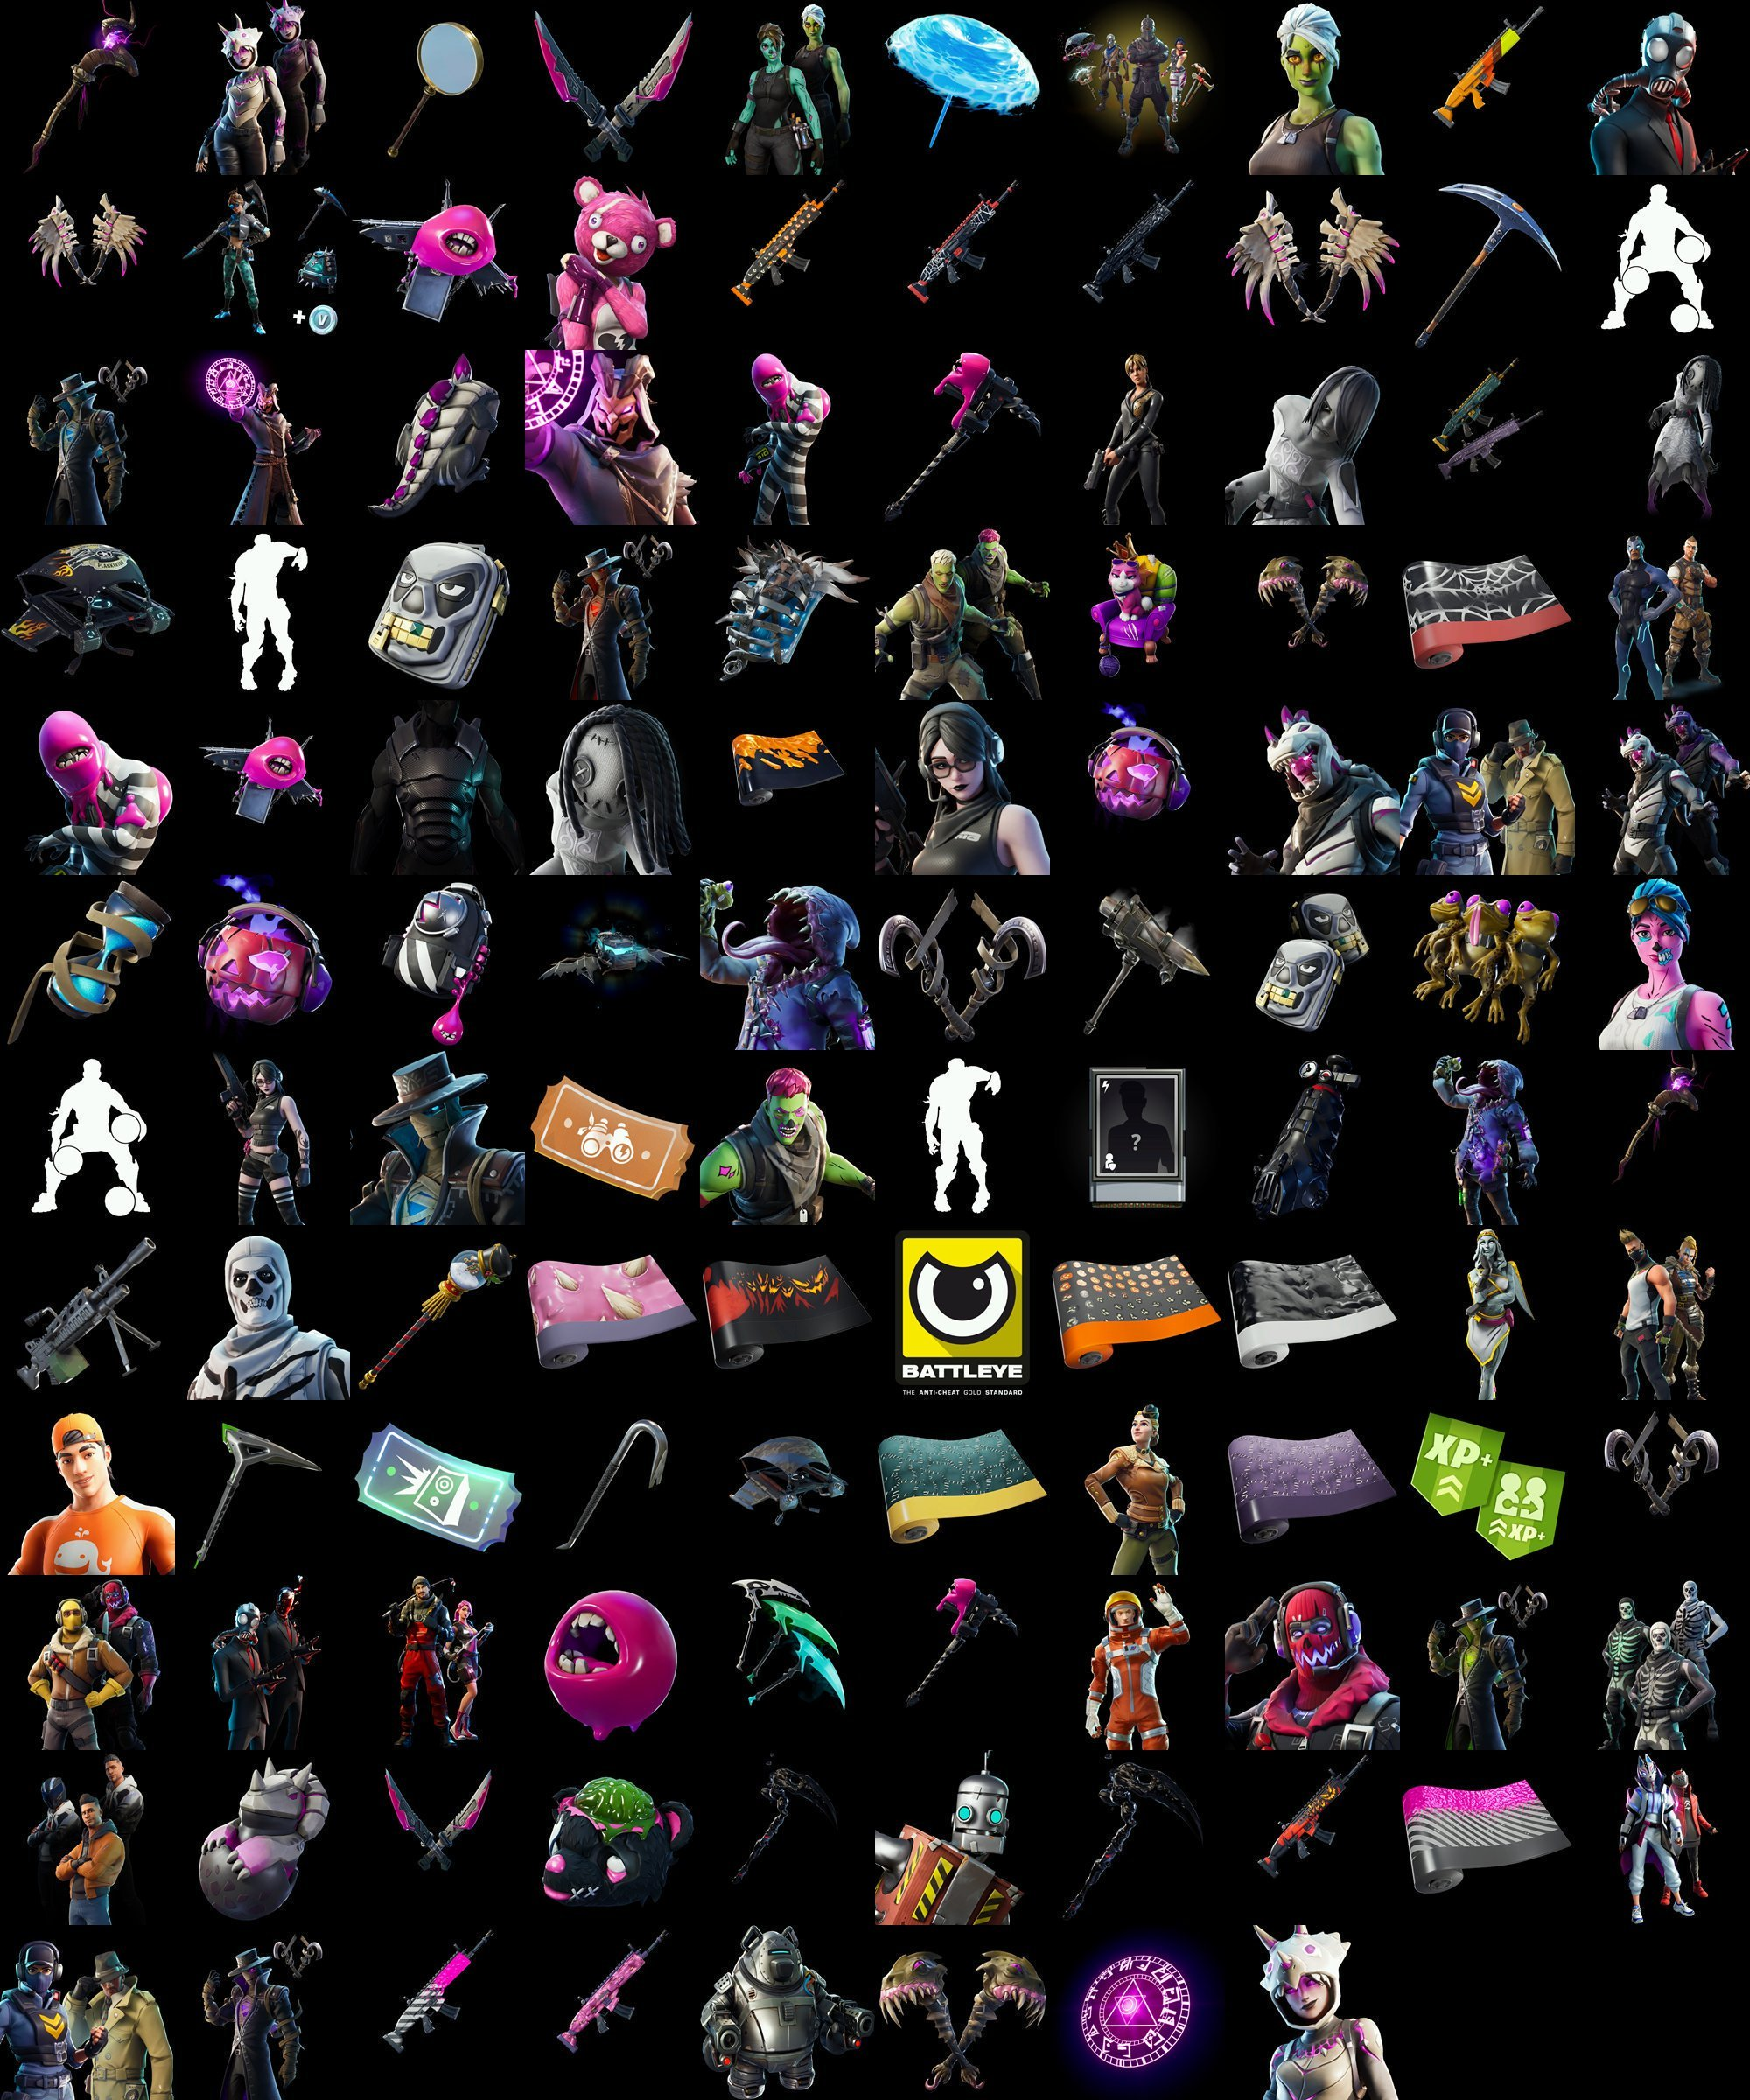 All Fortnite v11.01 Leaked Cosmetics